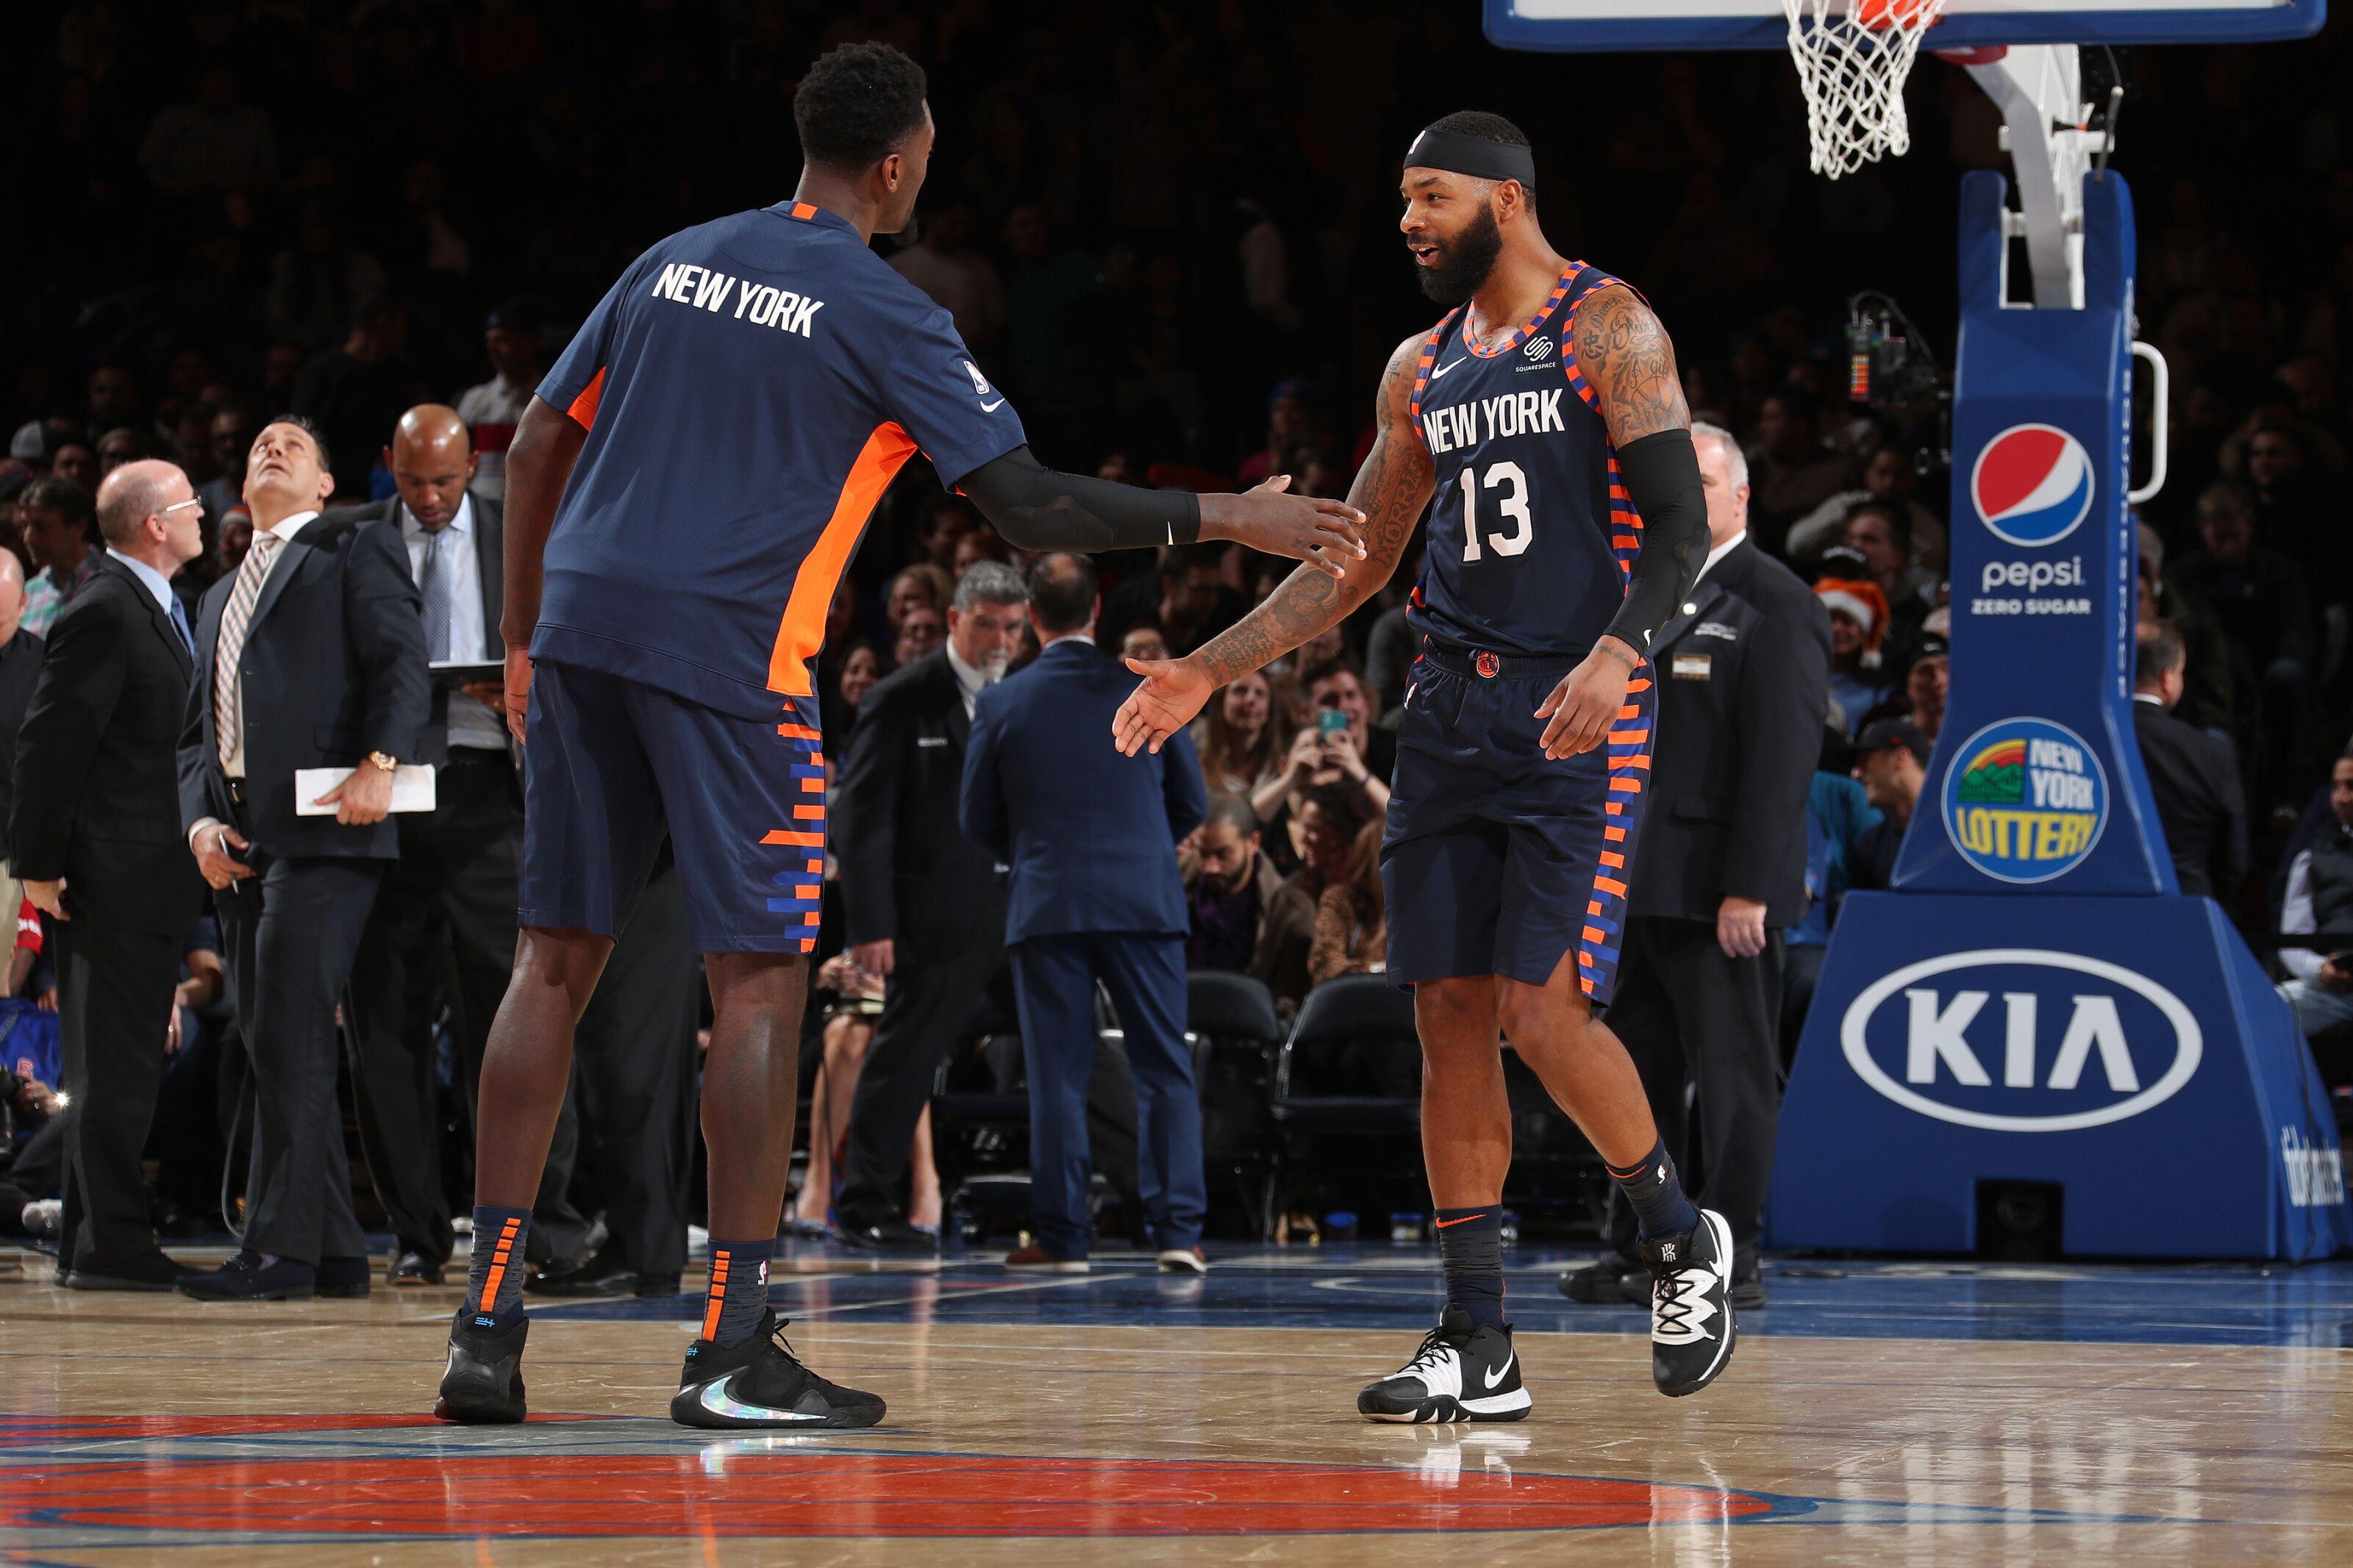 Knicks trade rumors: New York eyeing player market as Dec. 15 nears